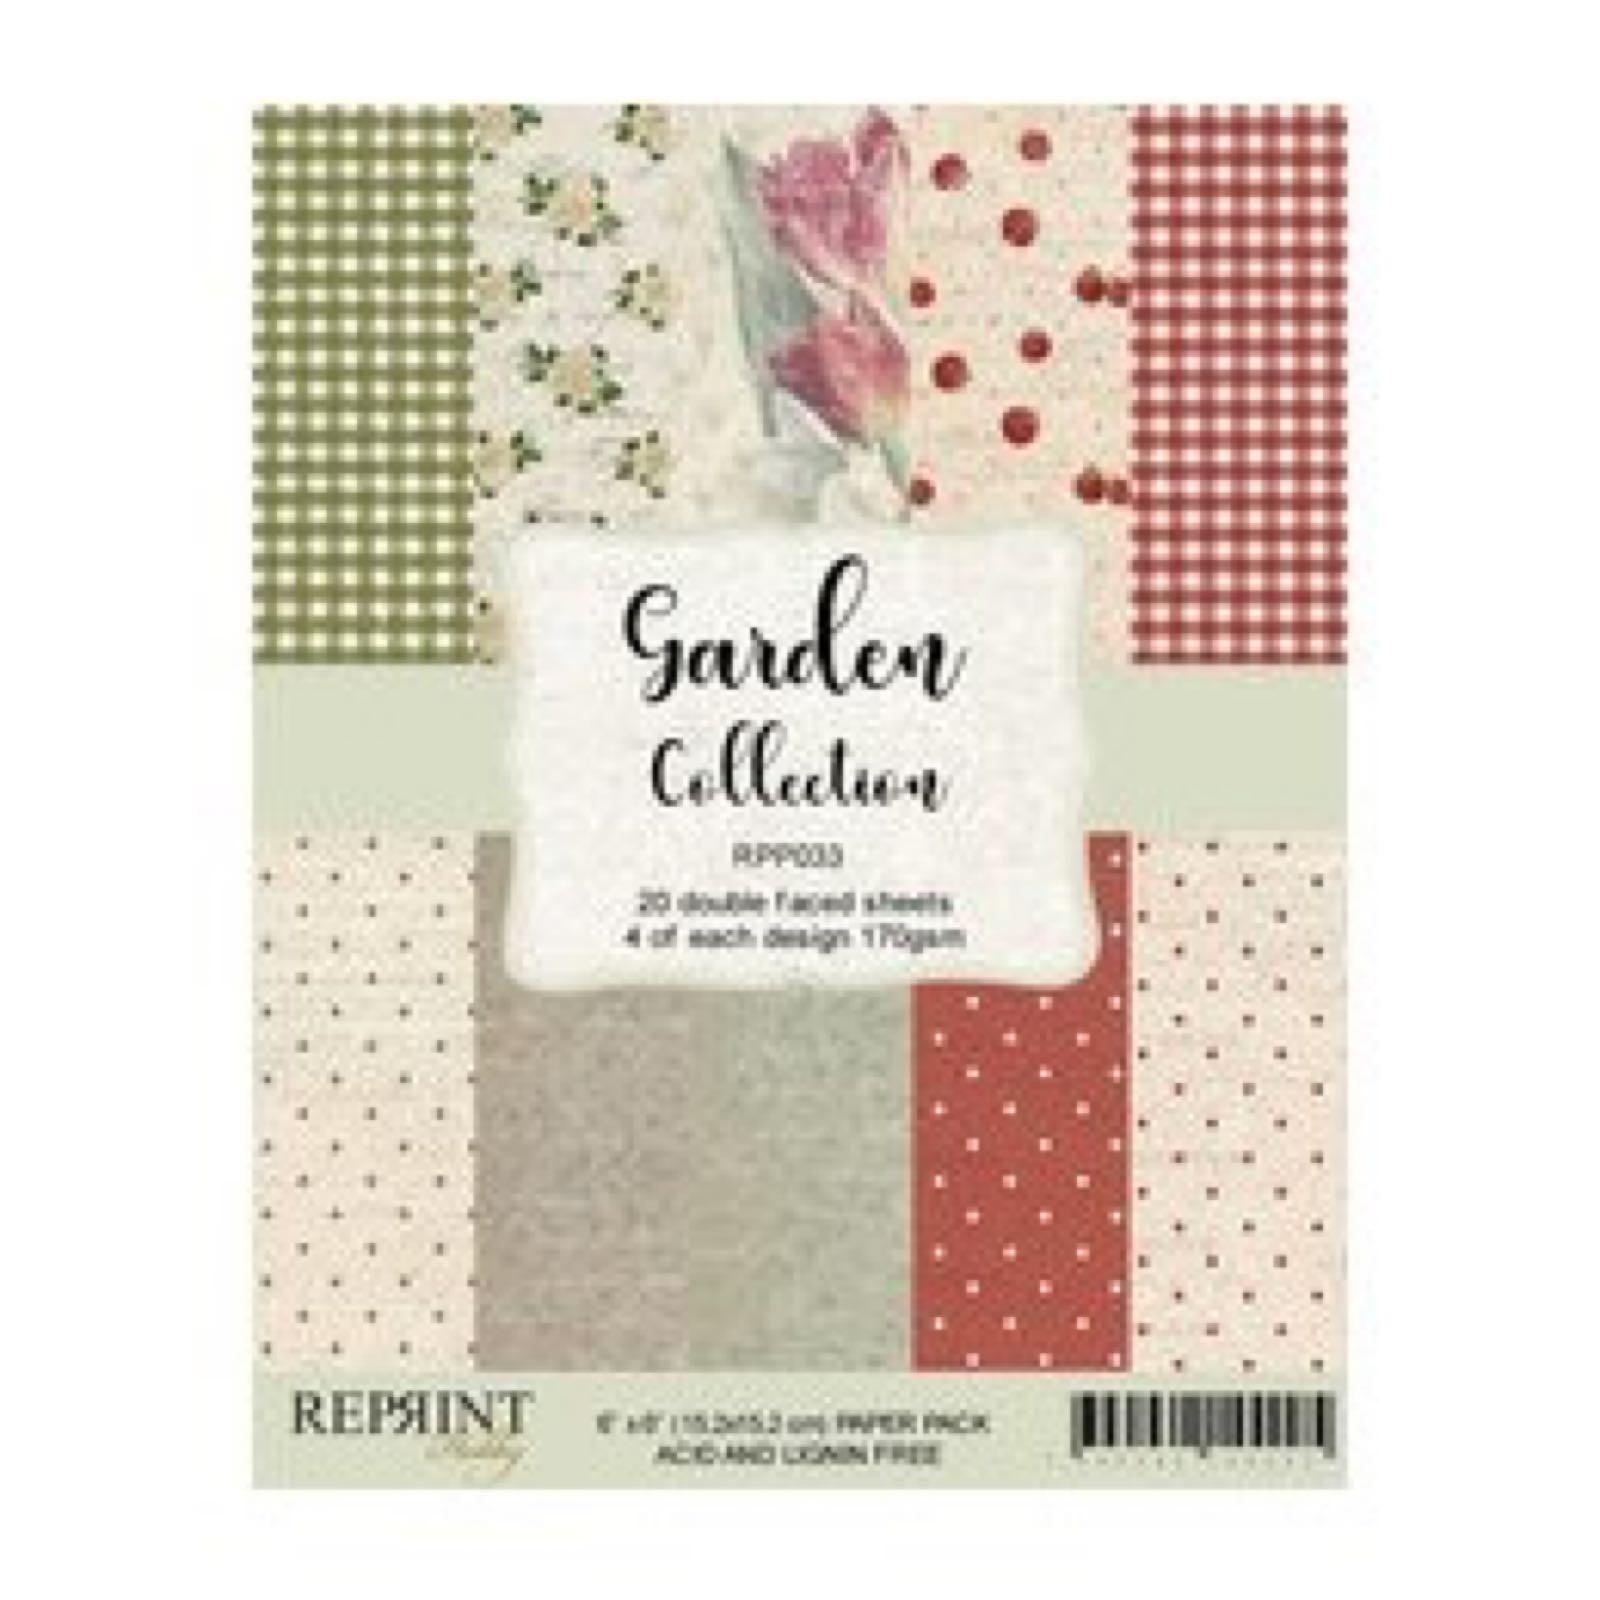 Reprint 6x6 , garden collection paper pack, RPP033